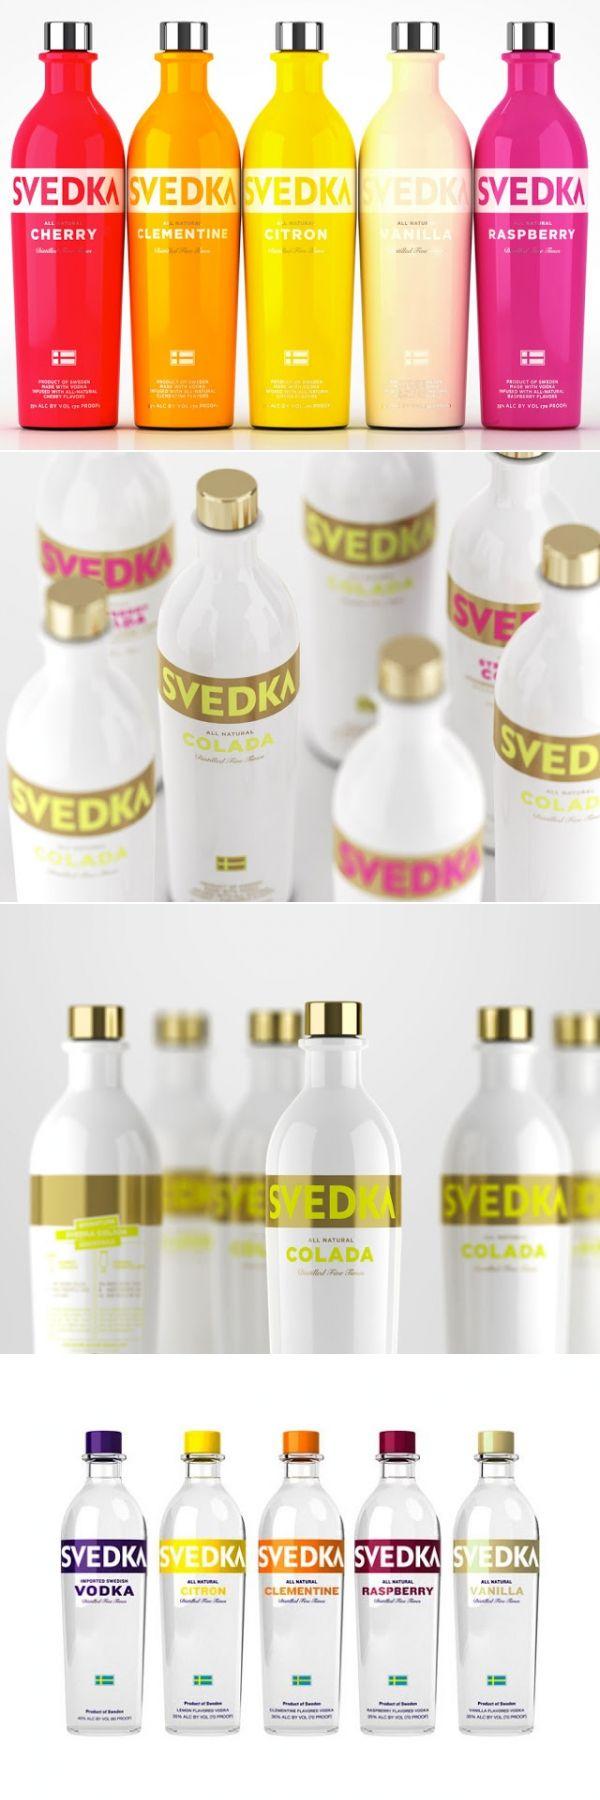 svedka vodka PD